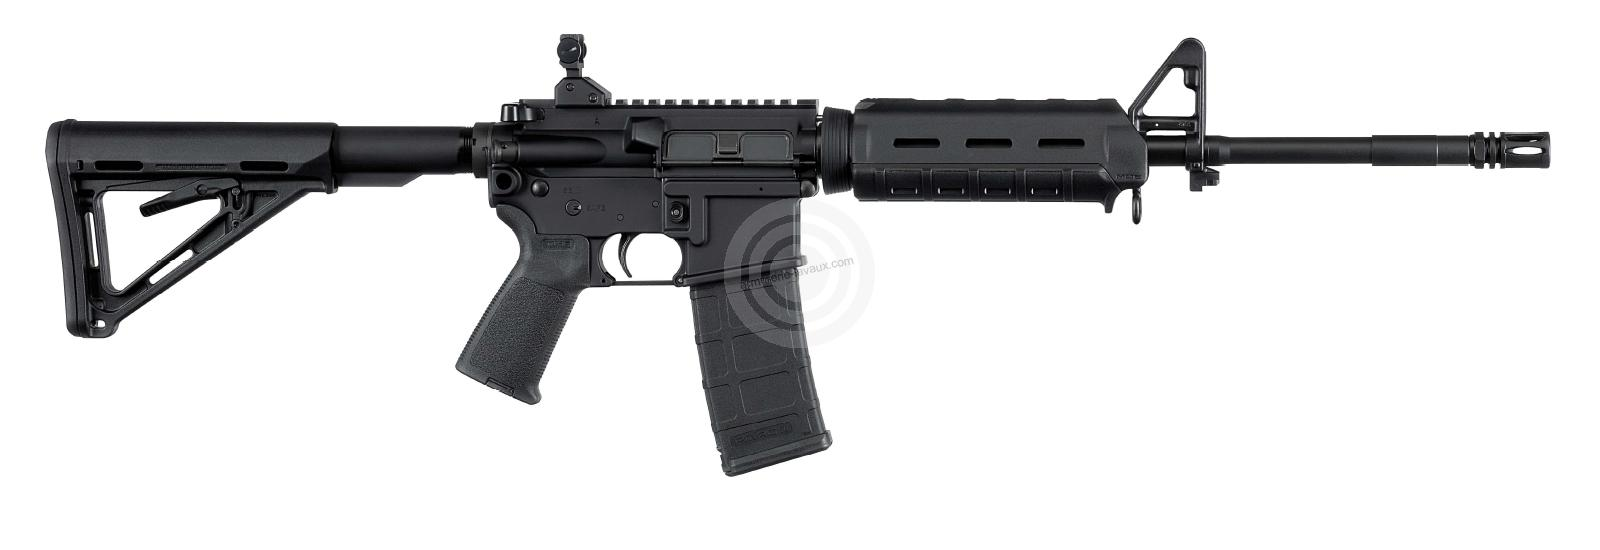 SIG SAUER M400 Enhanced Magbul cal.223 Rem